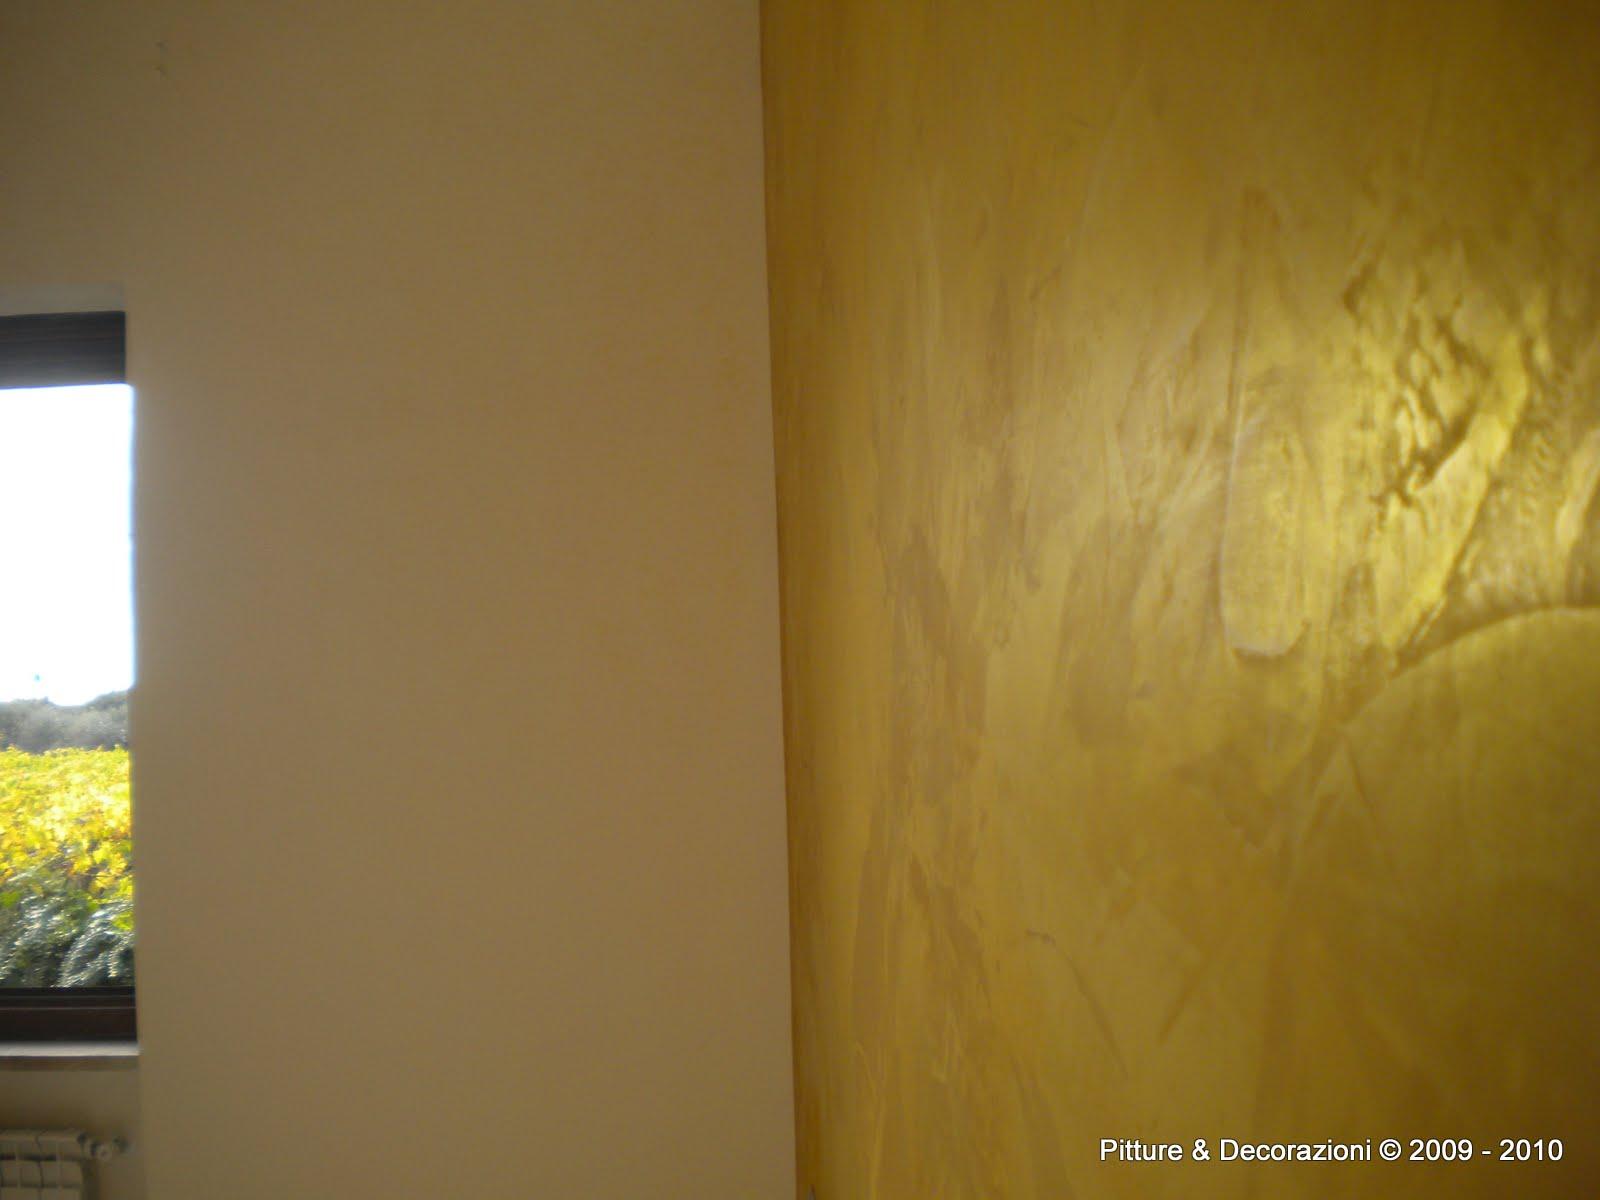 Pitture decorazioni oikos aureum for Oikos colori interni